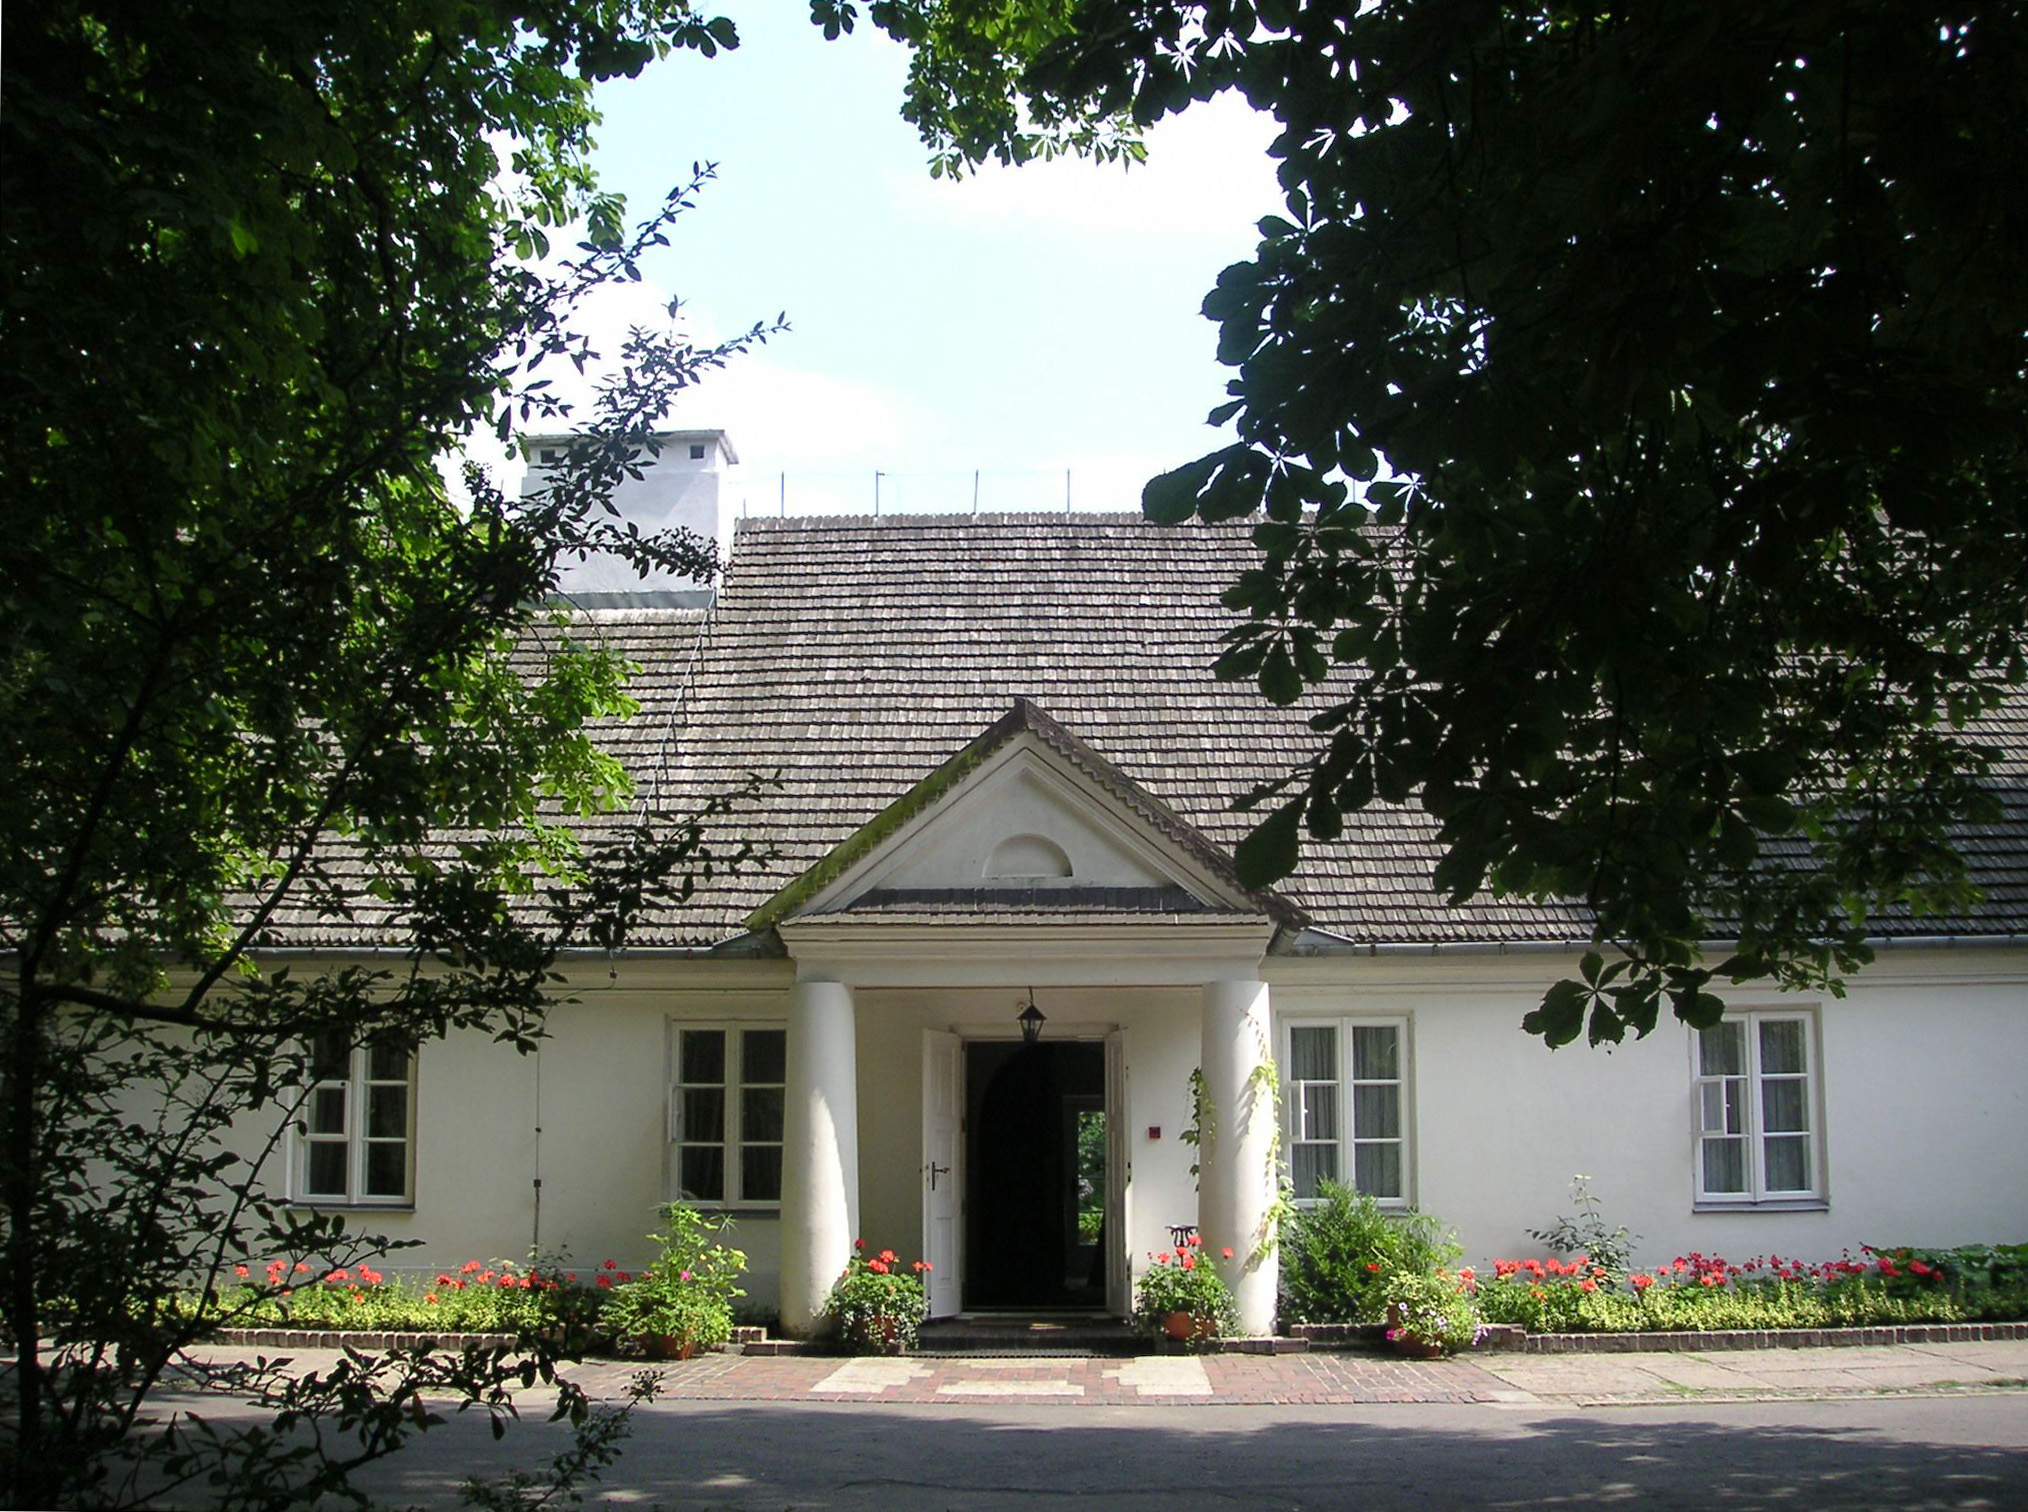 Casa natal de Chopin en Żelazowa Wola.